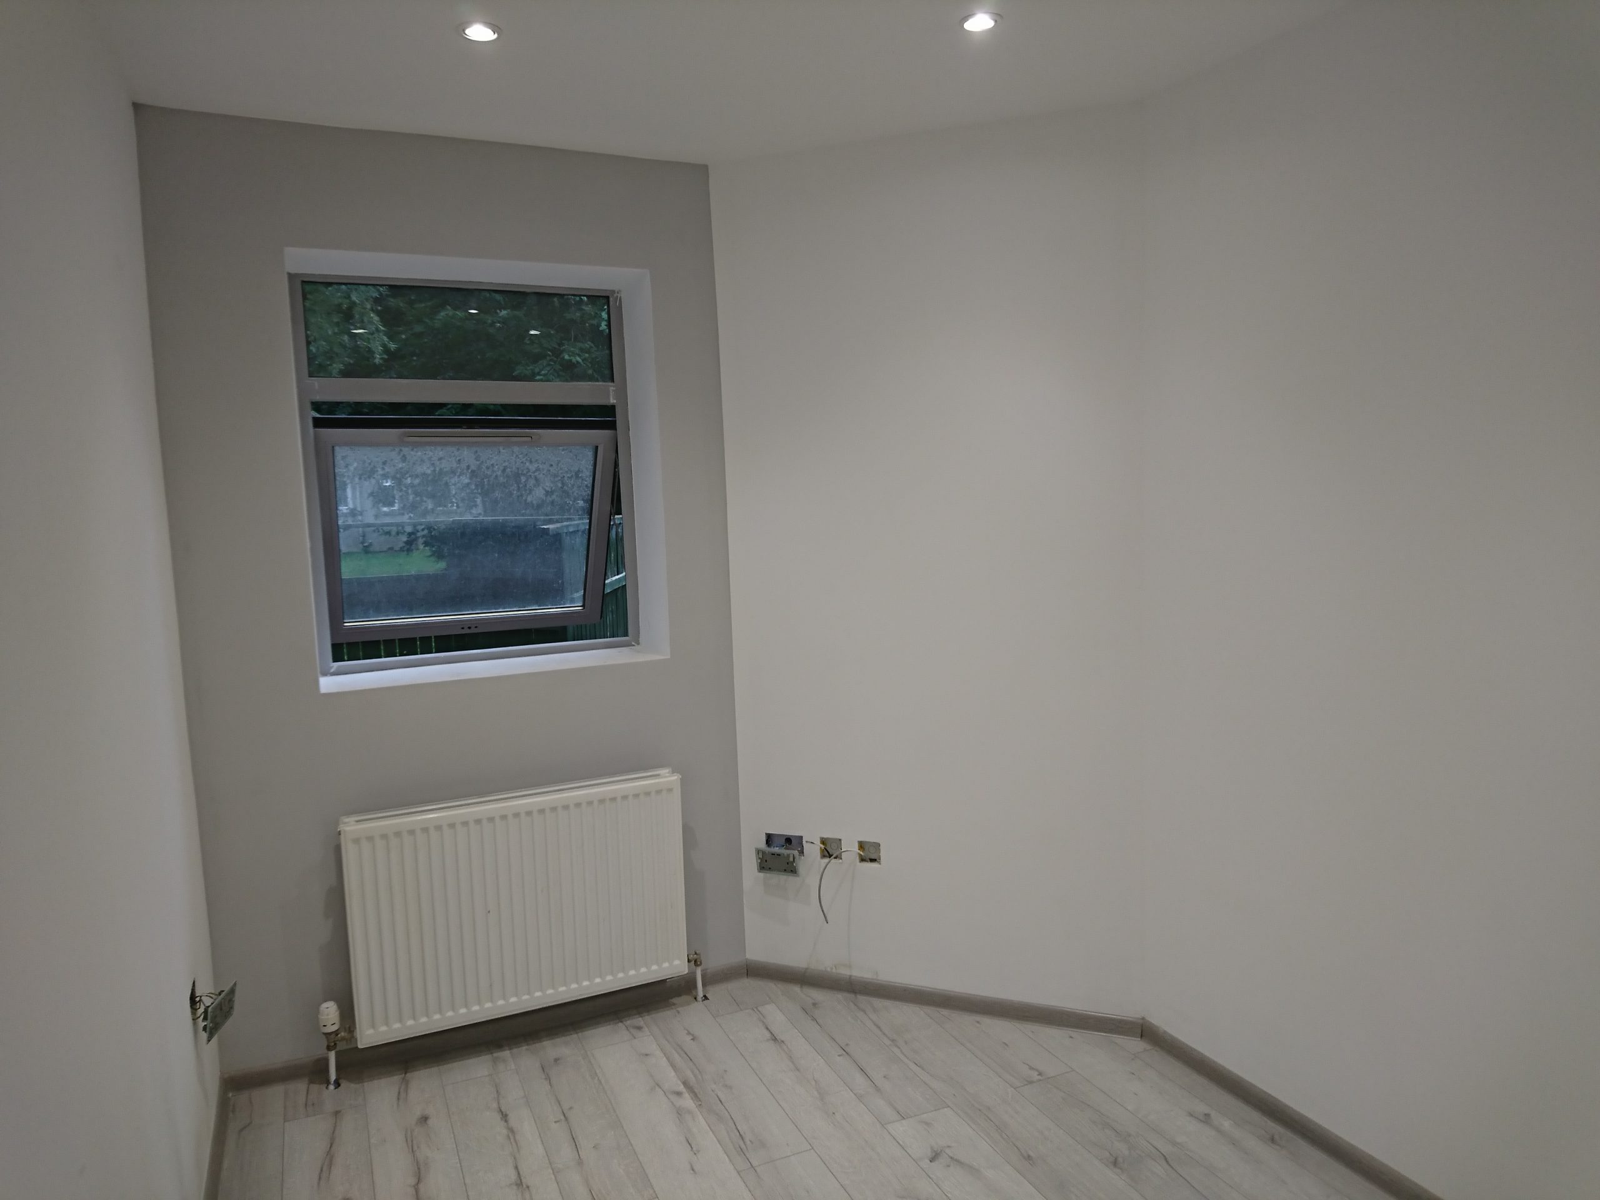 solid-wall-insulation-edinburgh-insulated-render-edinburgh